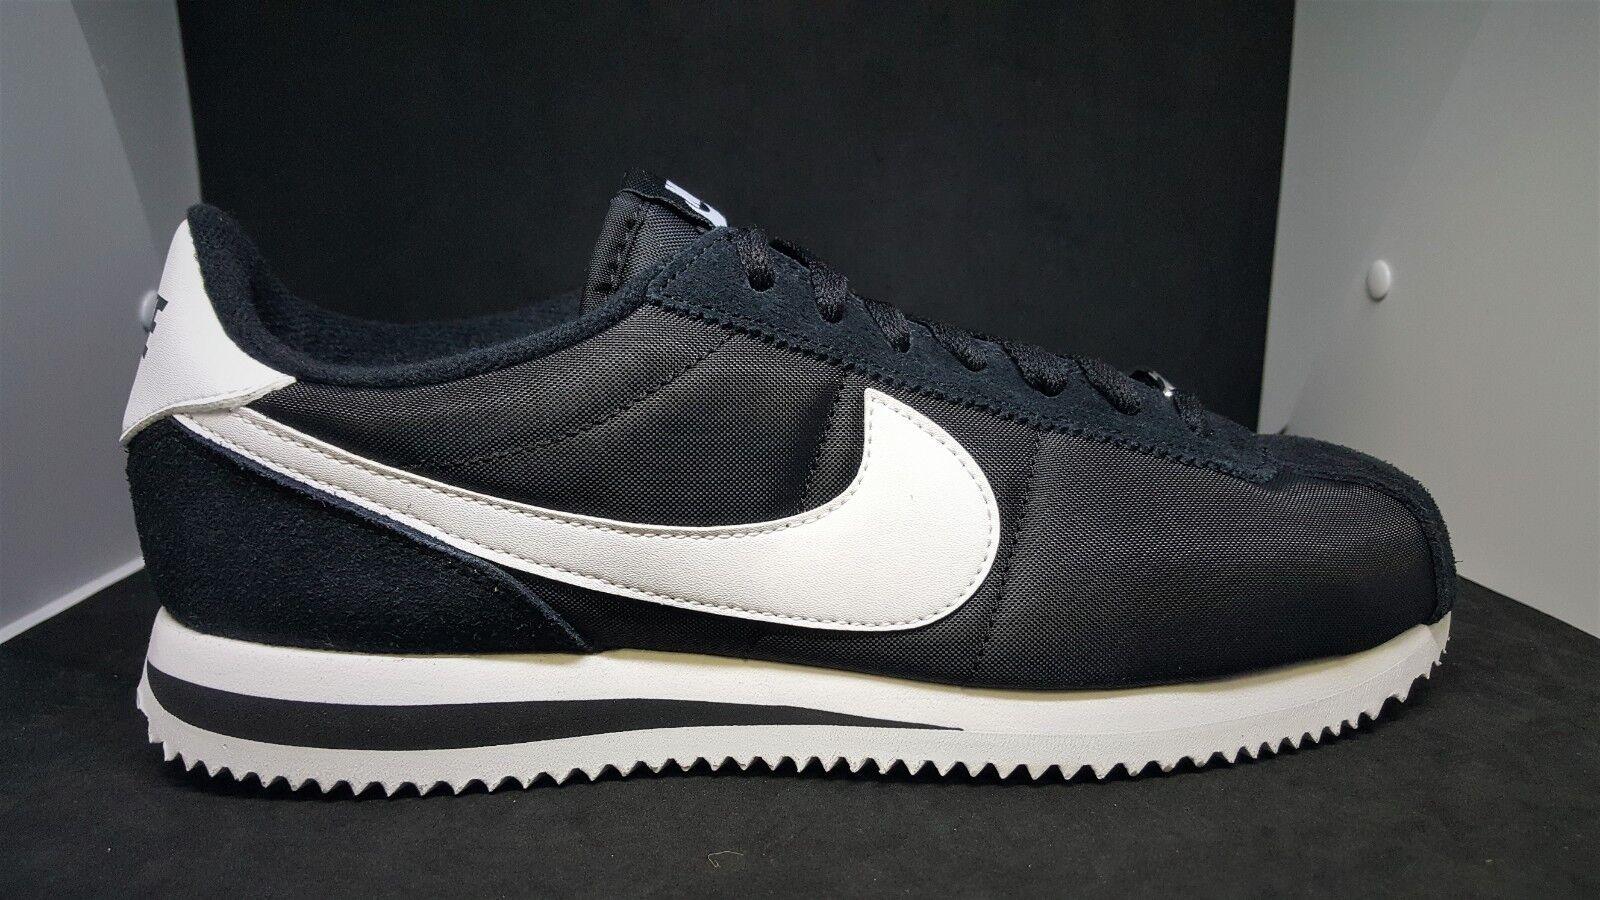 Nike Classic Cortez Nylon Black White Men shoes Lifestyle Sneakers 819720-011